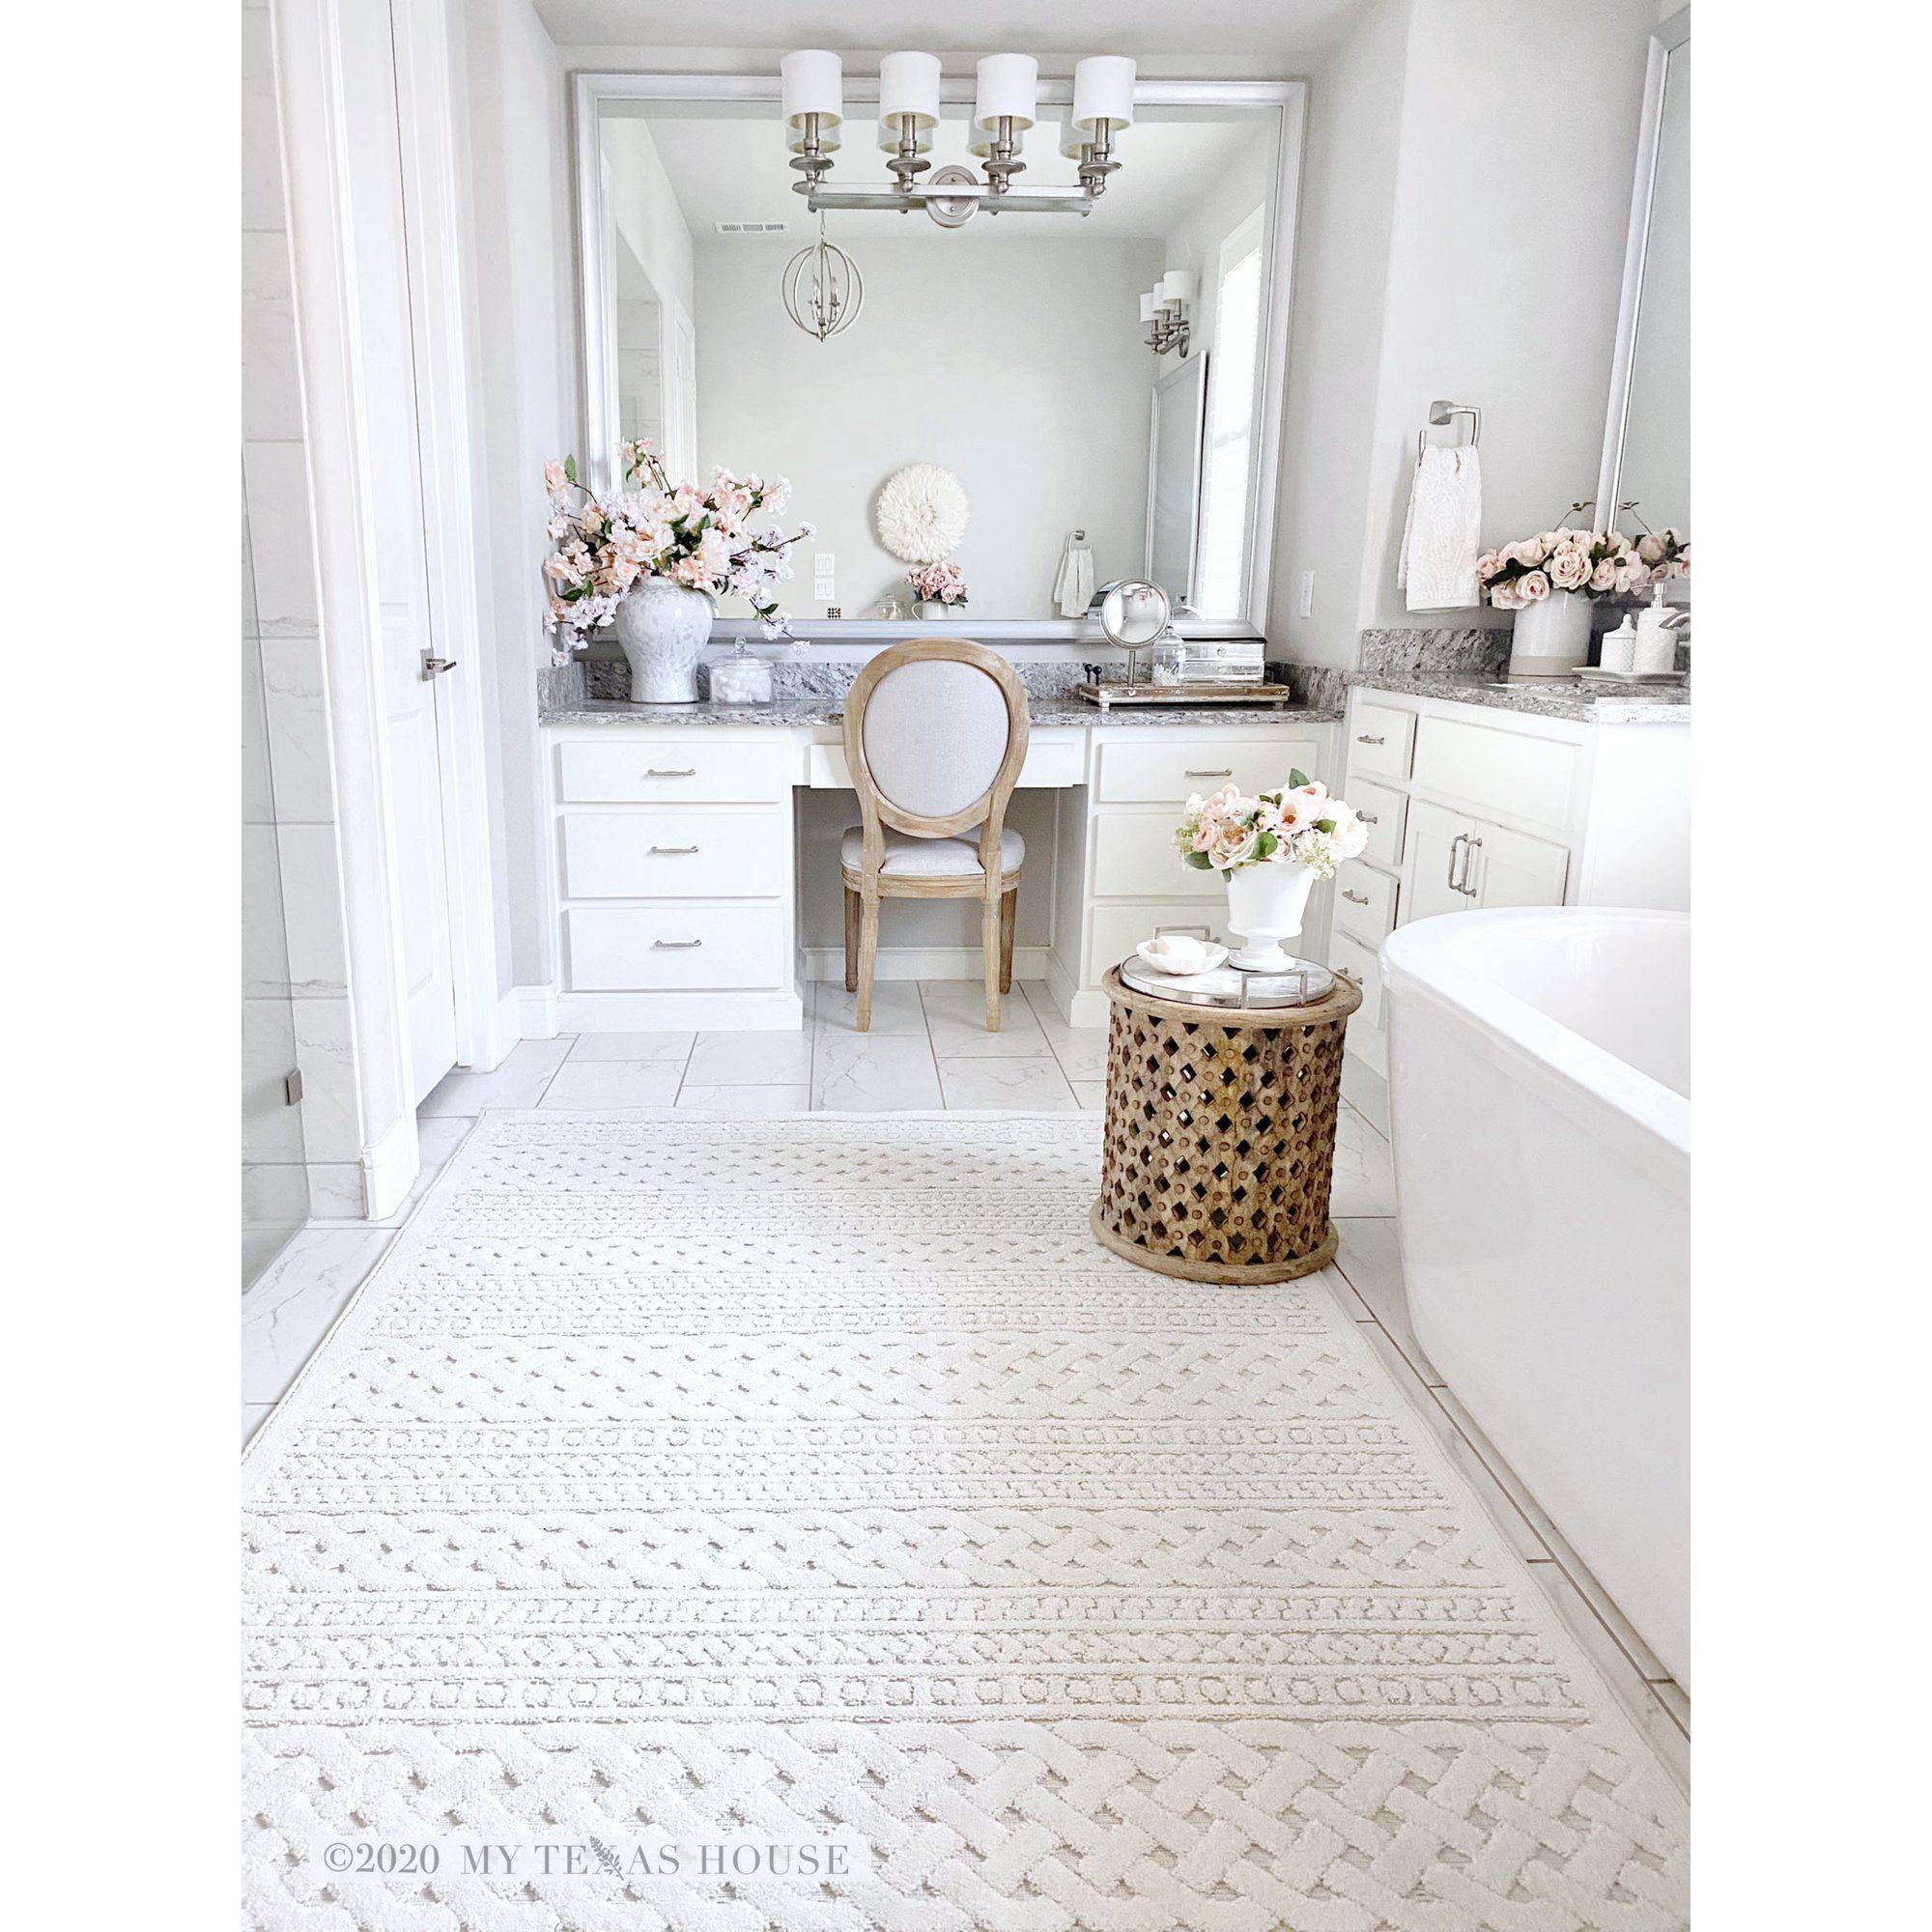 My Texas House By Orian Jessie Area Rug Walmart Com In 2021 Large Bathroom Rugs Master Bathroom Decor Bathroom Rug Ideas Master [ 2000 x 2000 Pixel ]